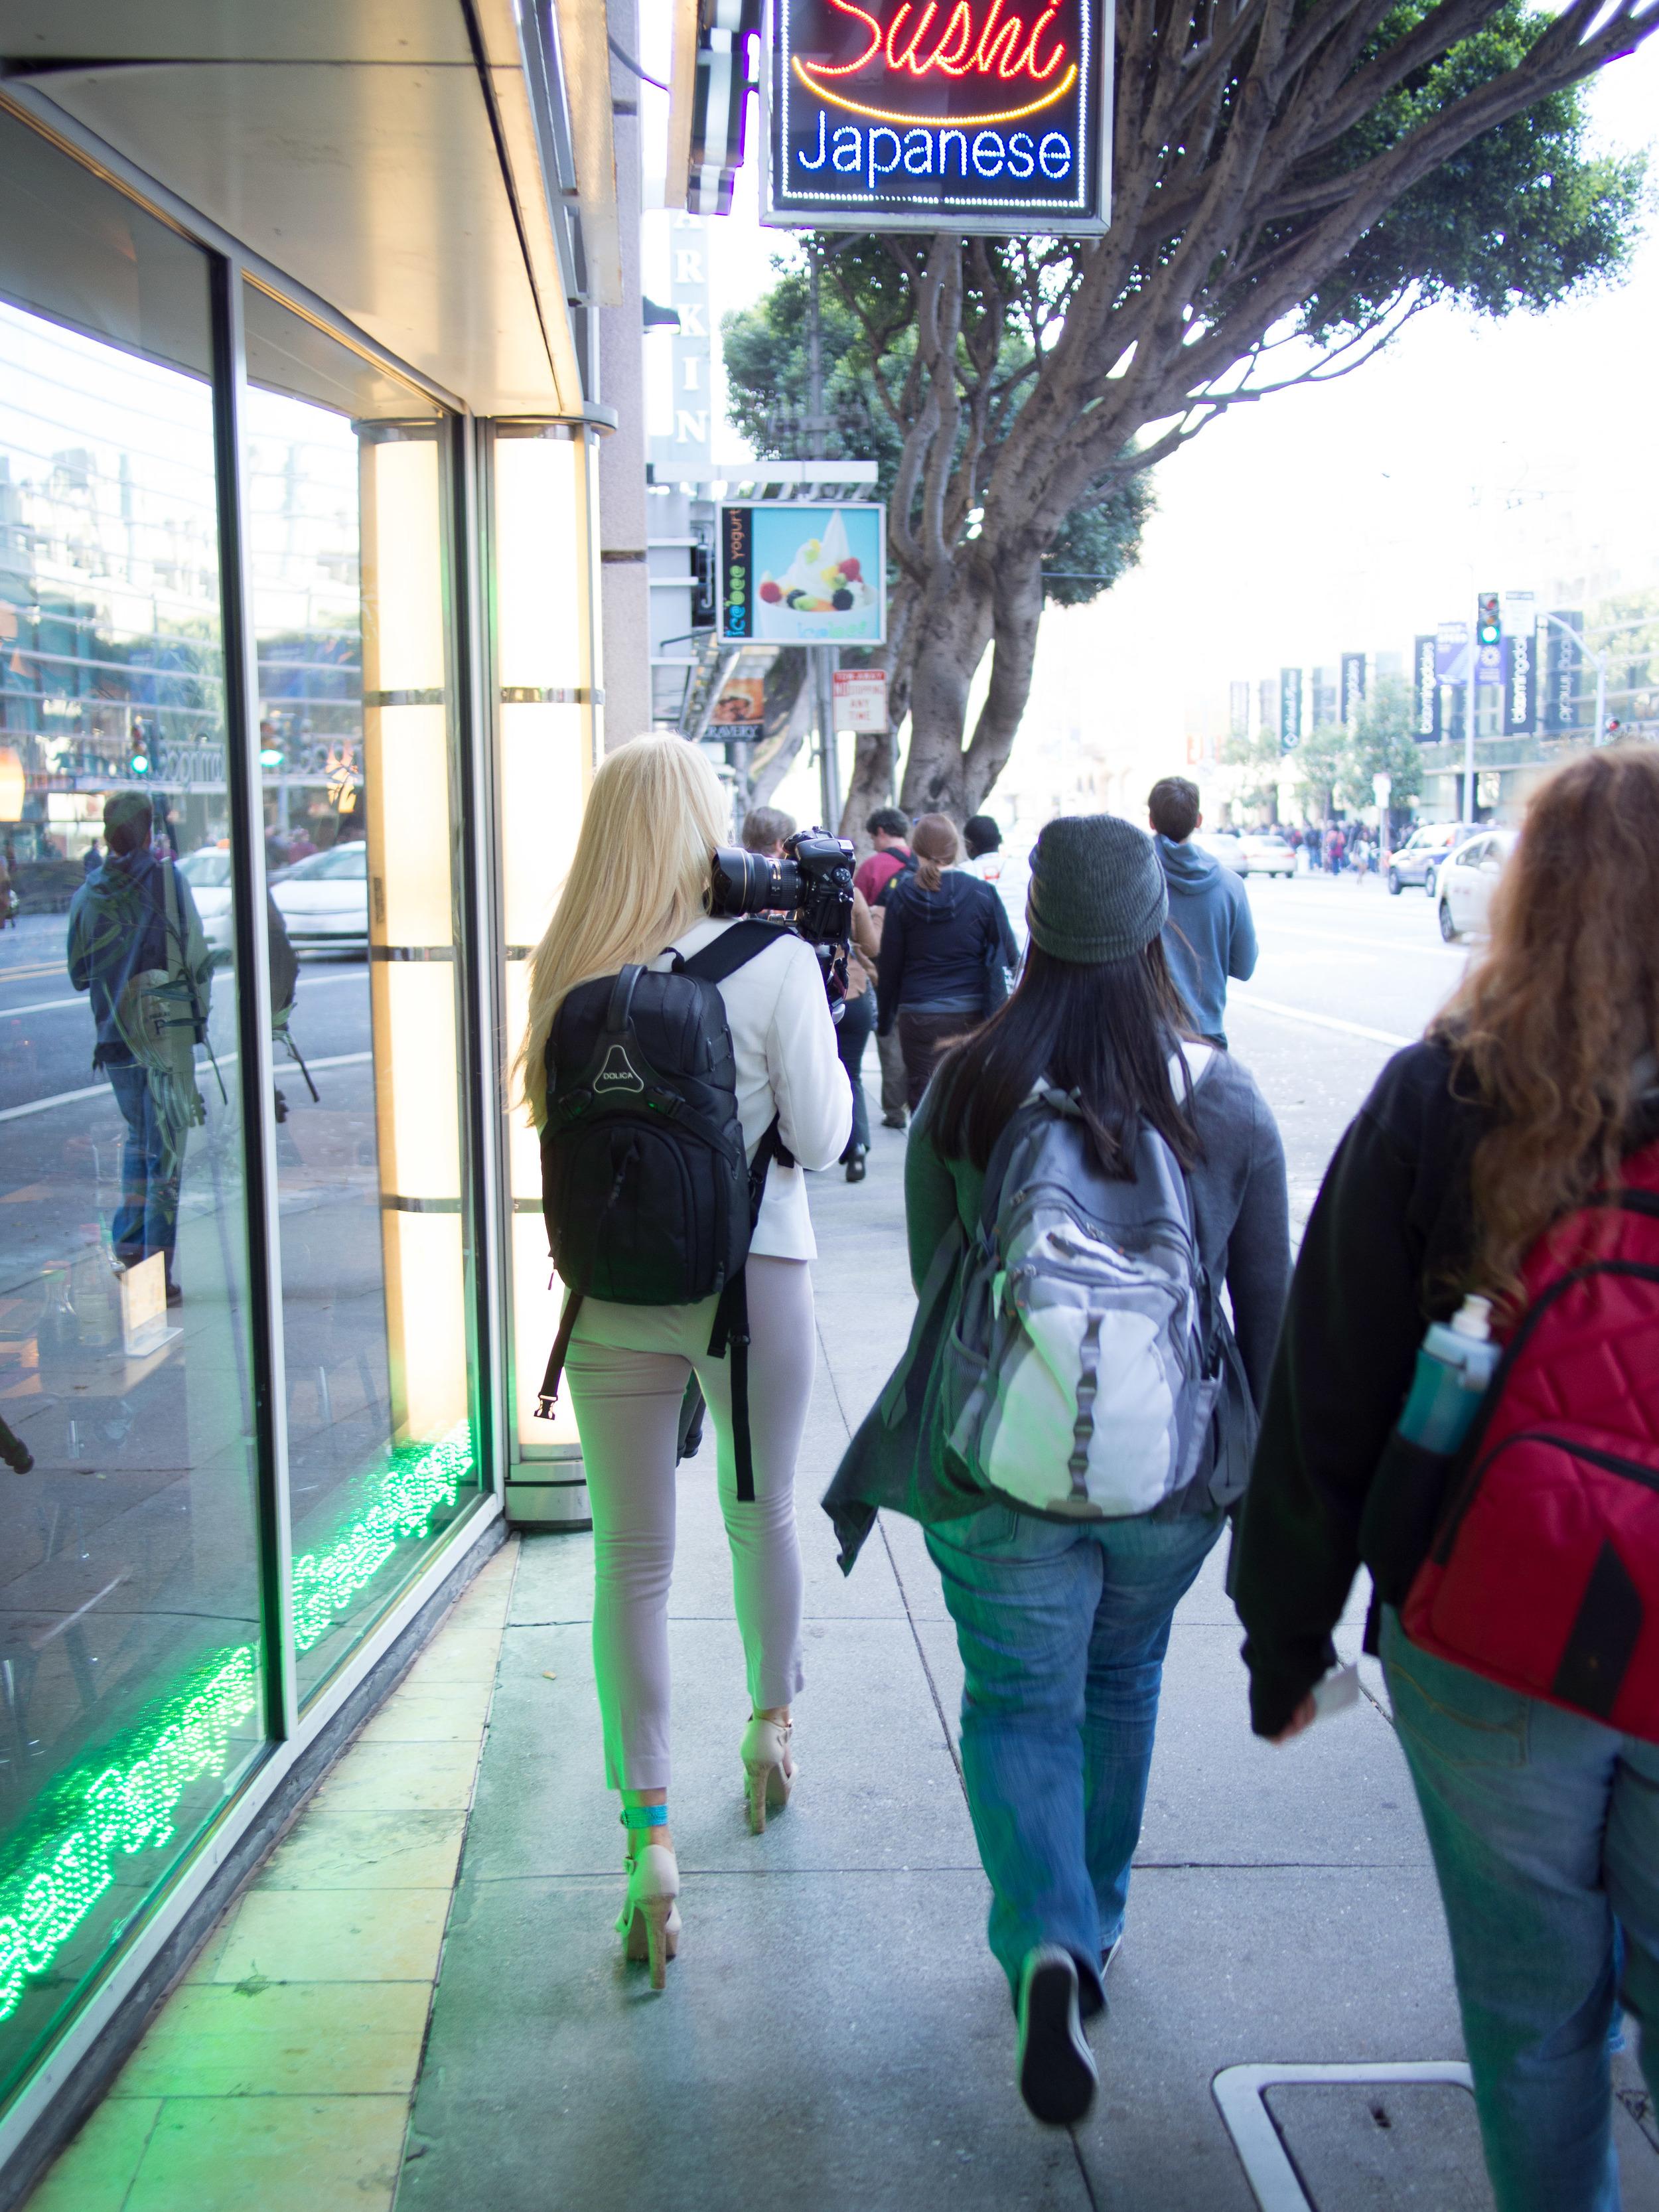 2013 05 14 SF Photowalk with Trey Ratcliff and Thomas Hawk-7 (7 of 12).jpg